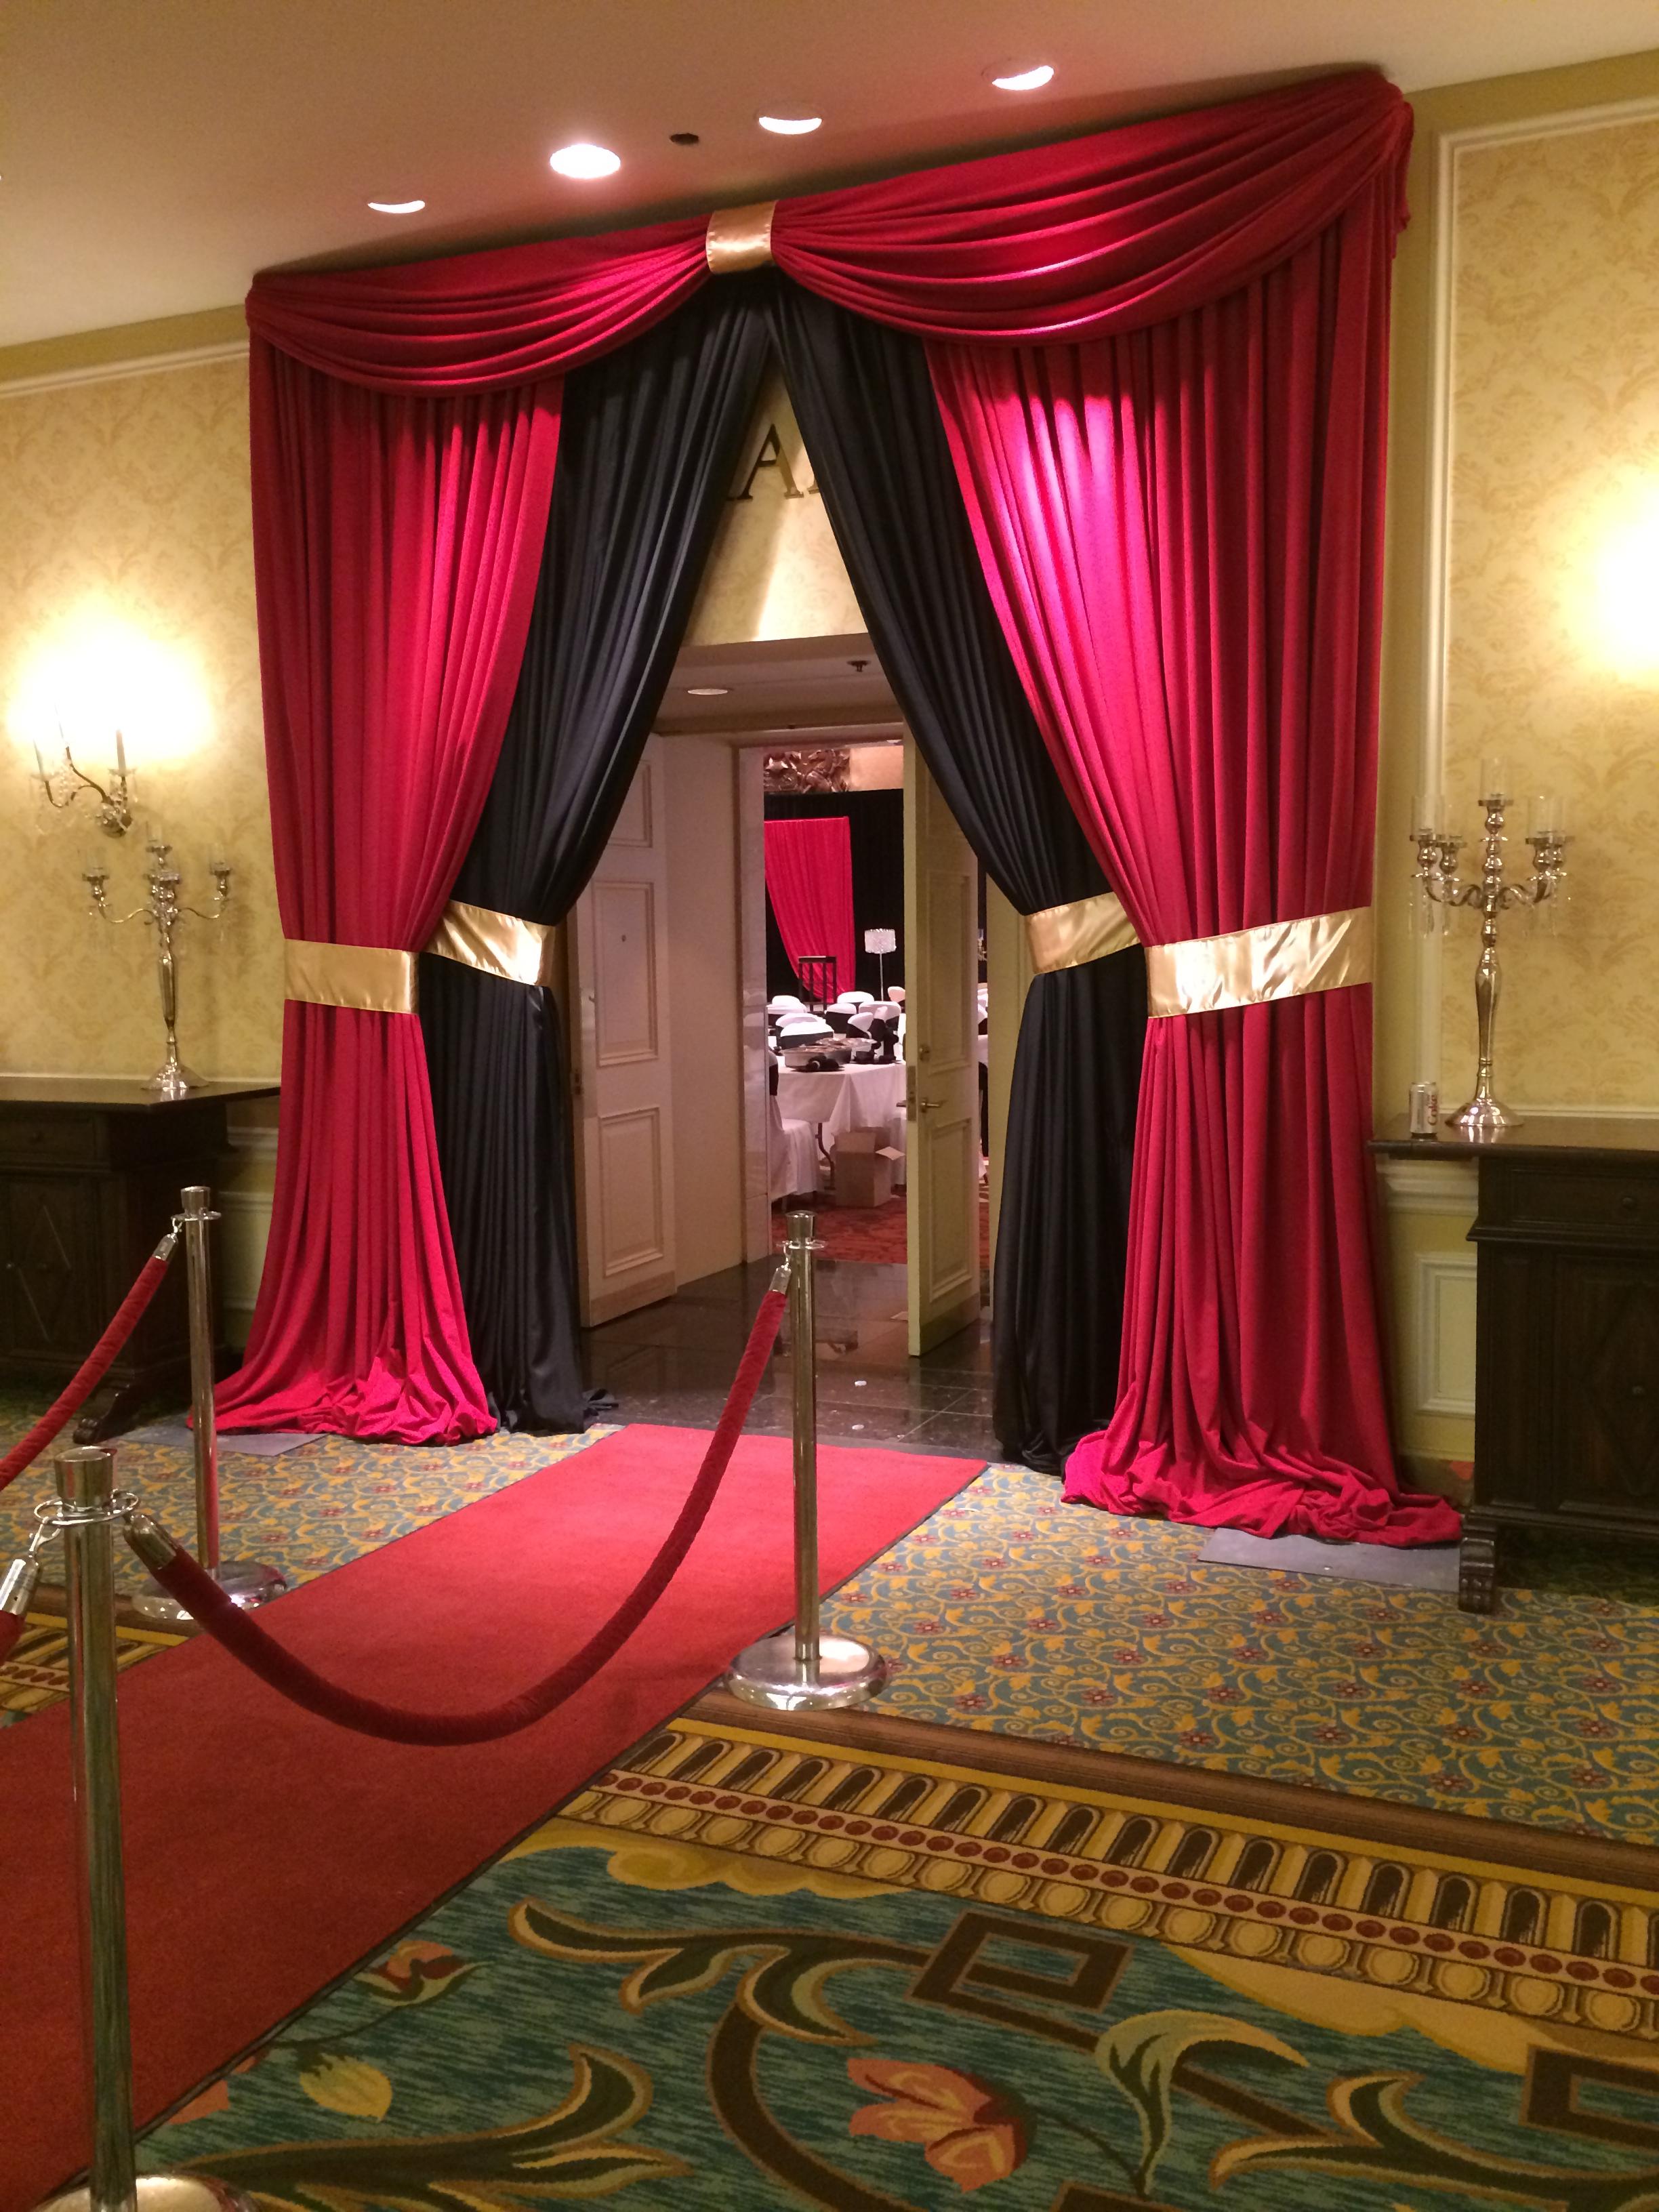 Prom Galleries Annie Lane Events amp Decor